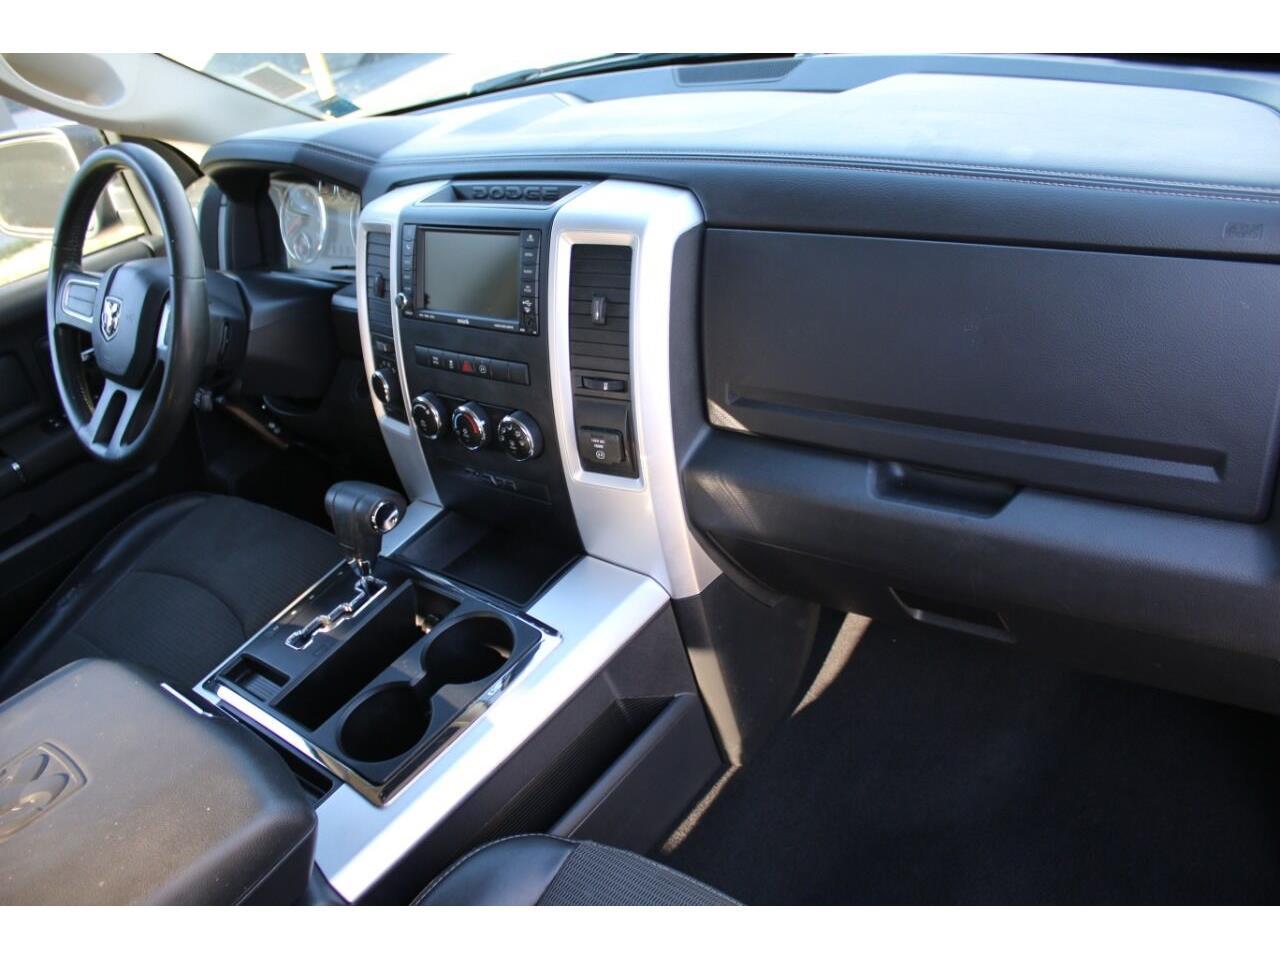 2011 Dodge Ram 1500 (CC-1417999) for sale in Hilton, New York